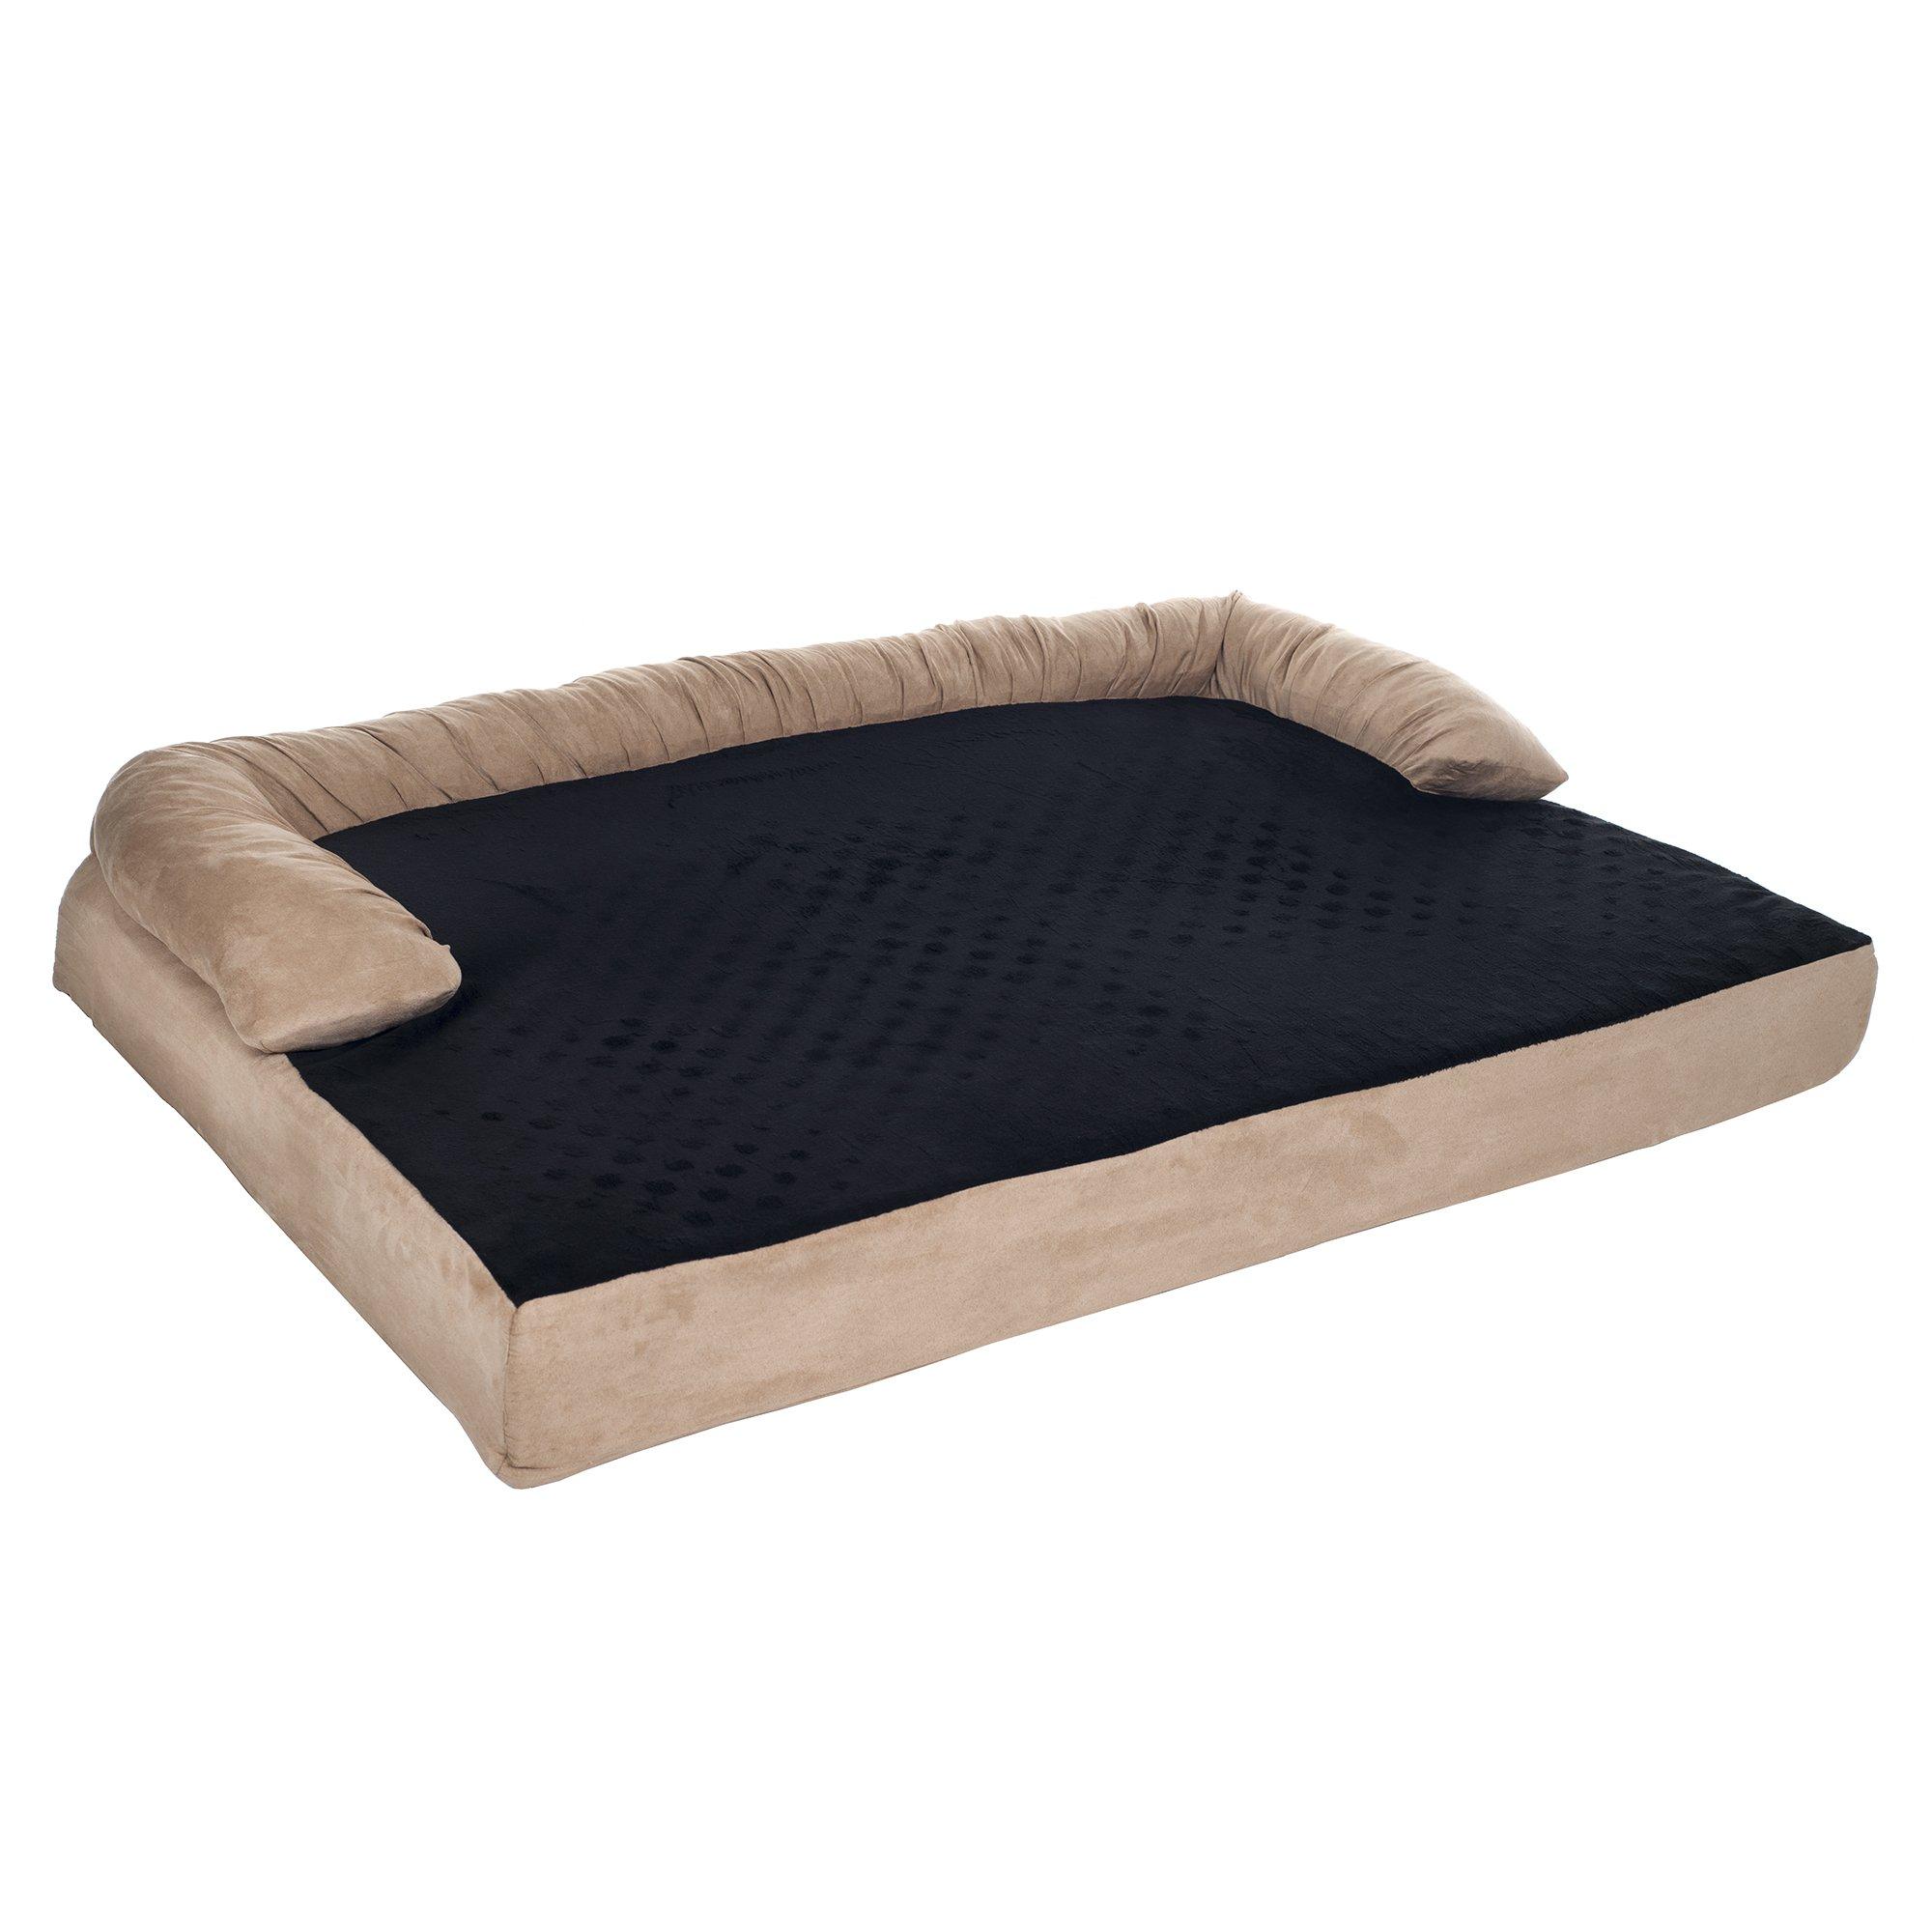 PETMAKER Orthopedic Memory Foam Pet Bed with Bolster, Large